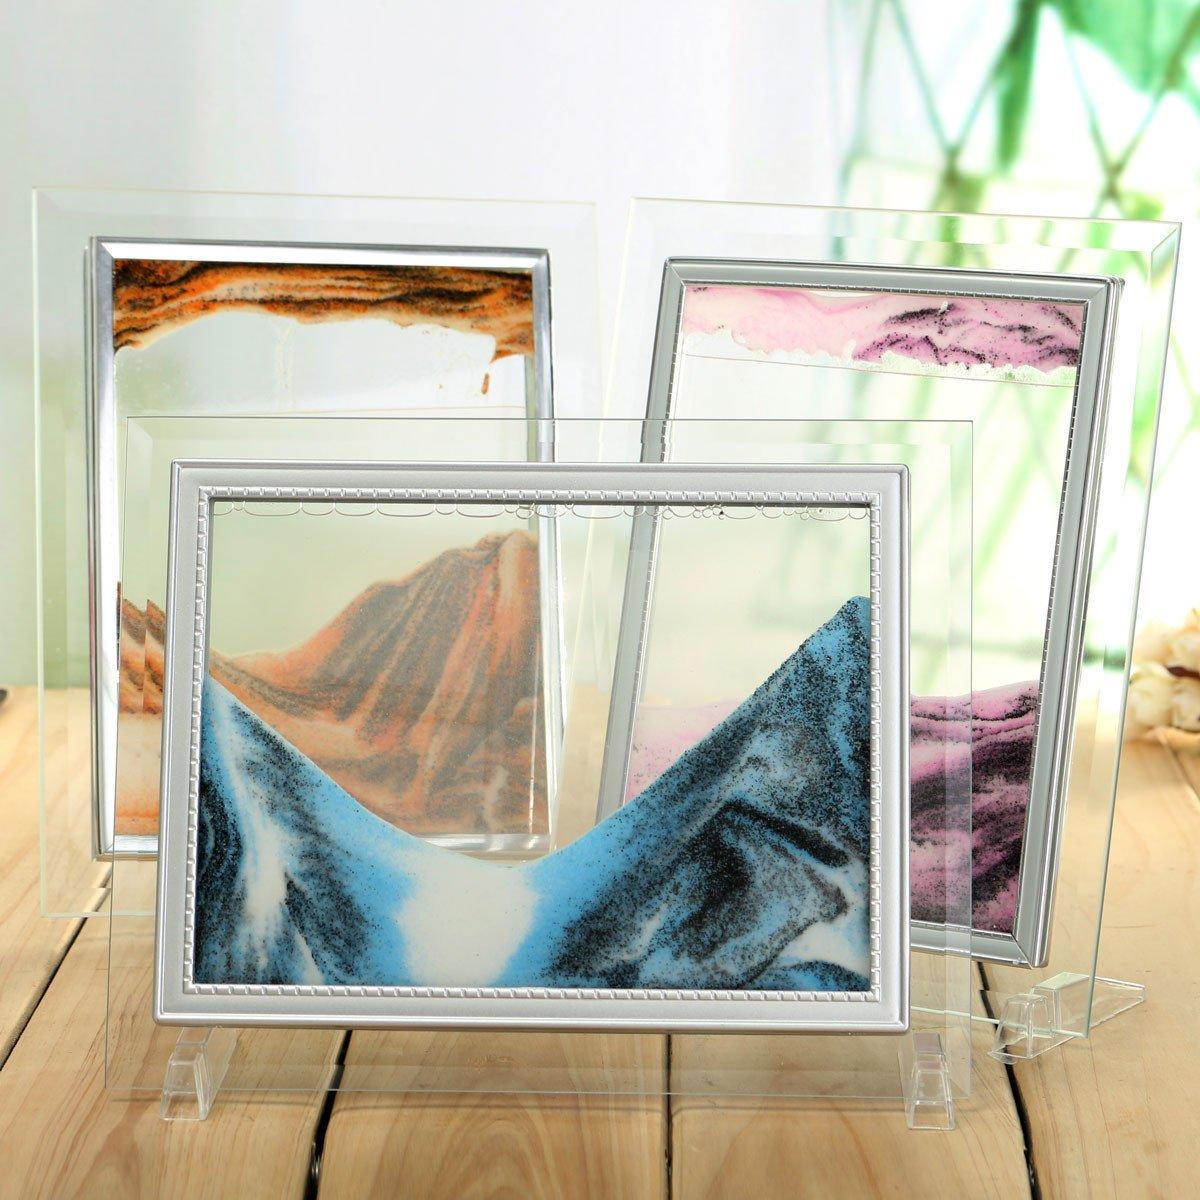 Bazaar Sand Art Picture Moving Sand Glass Home Office Desk Table Holder Decor Quicksand Birthday Gift Big Bazaar